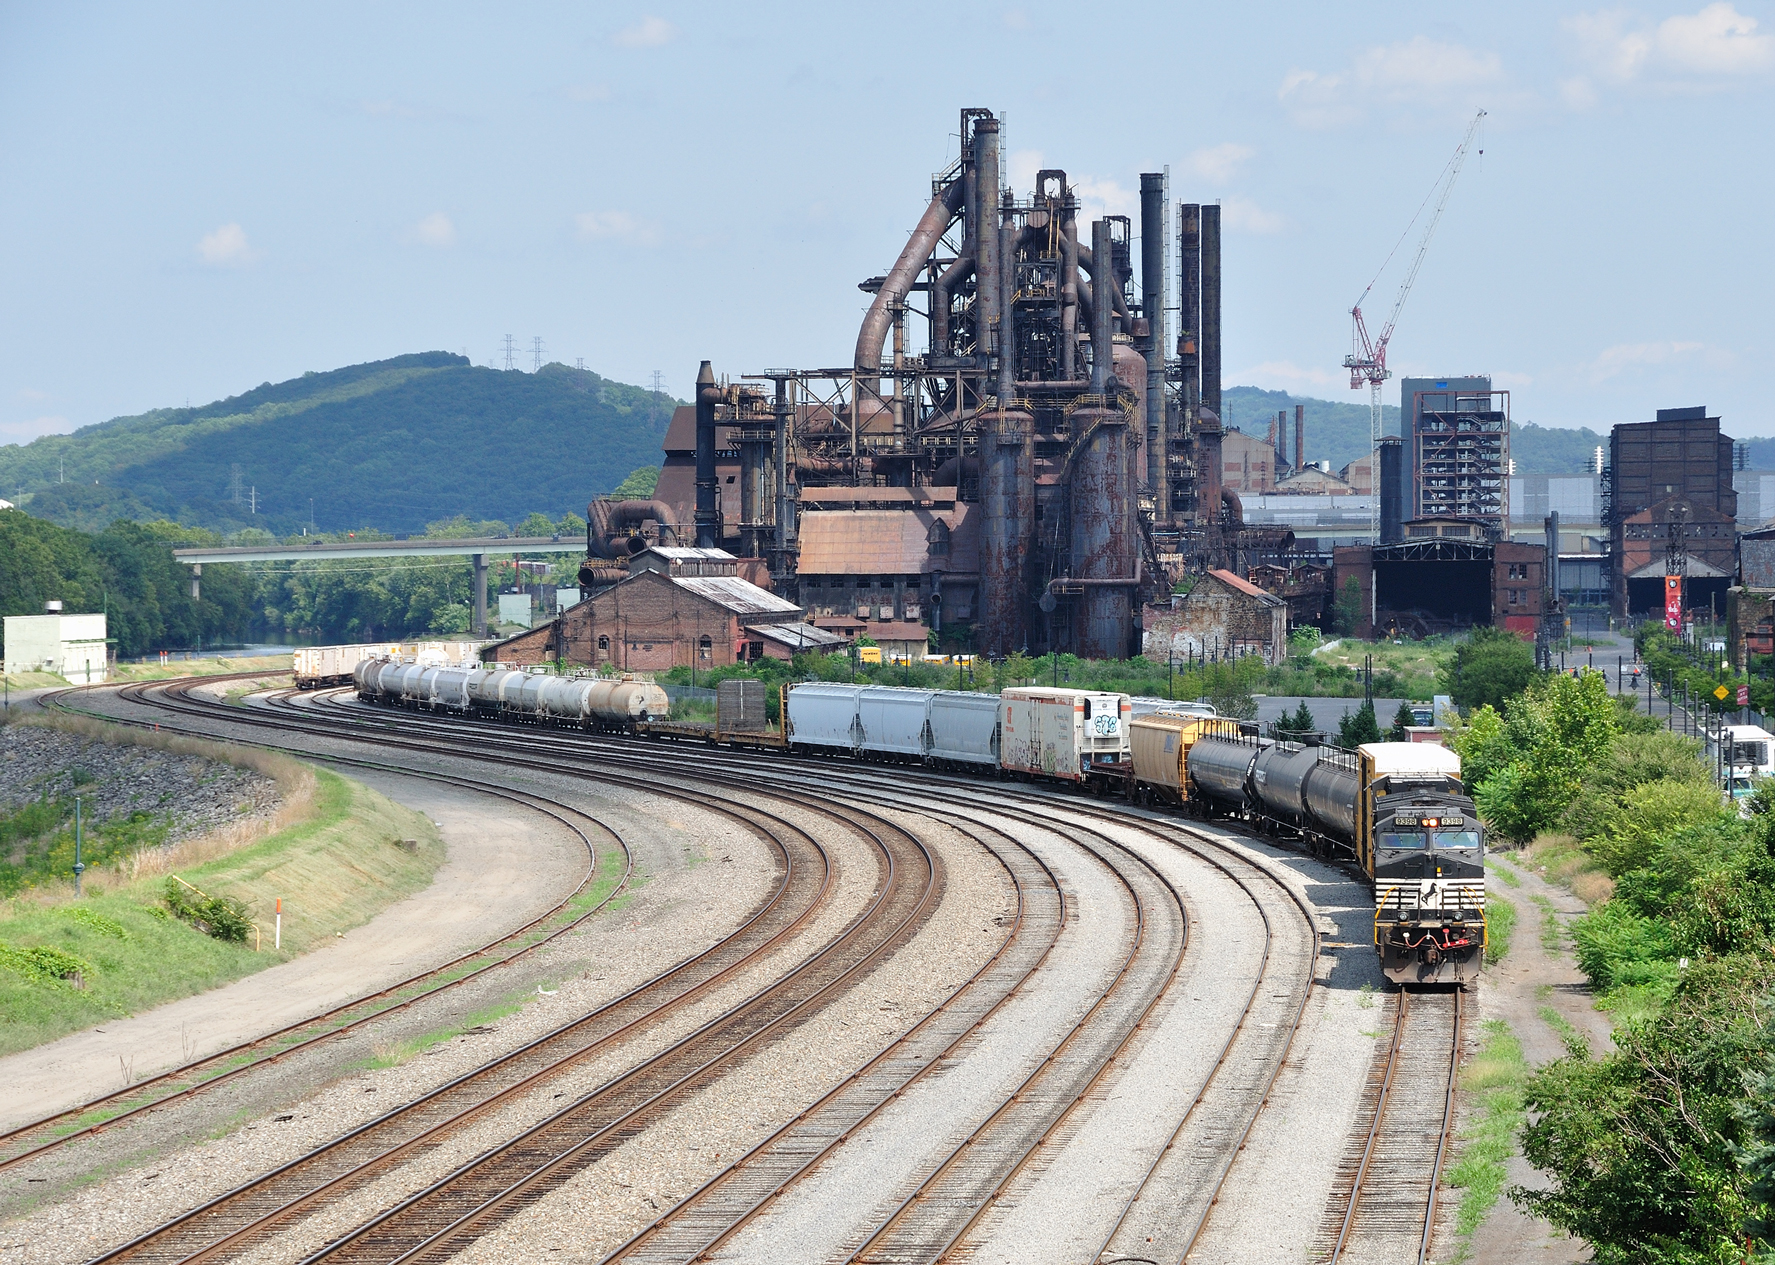 Dormant Bethlehem Steel mill backdrop for the many tracks of Norfolk Southern